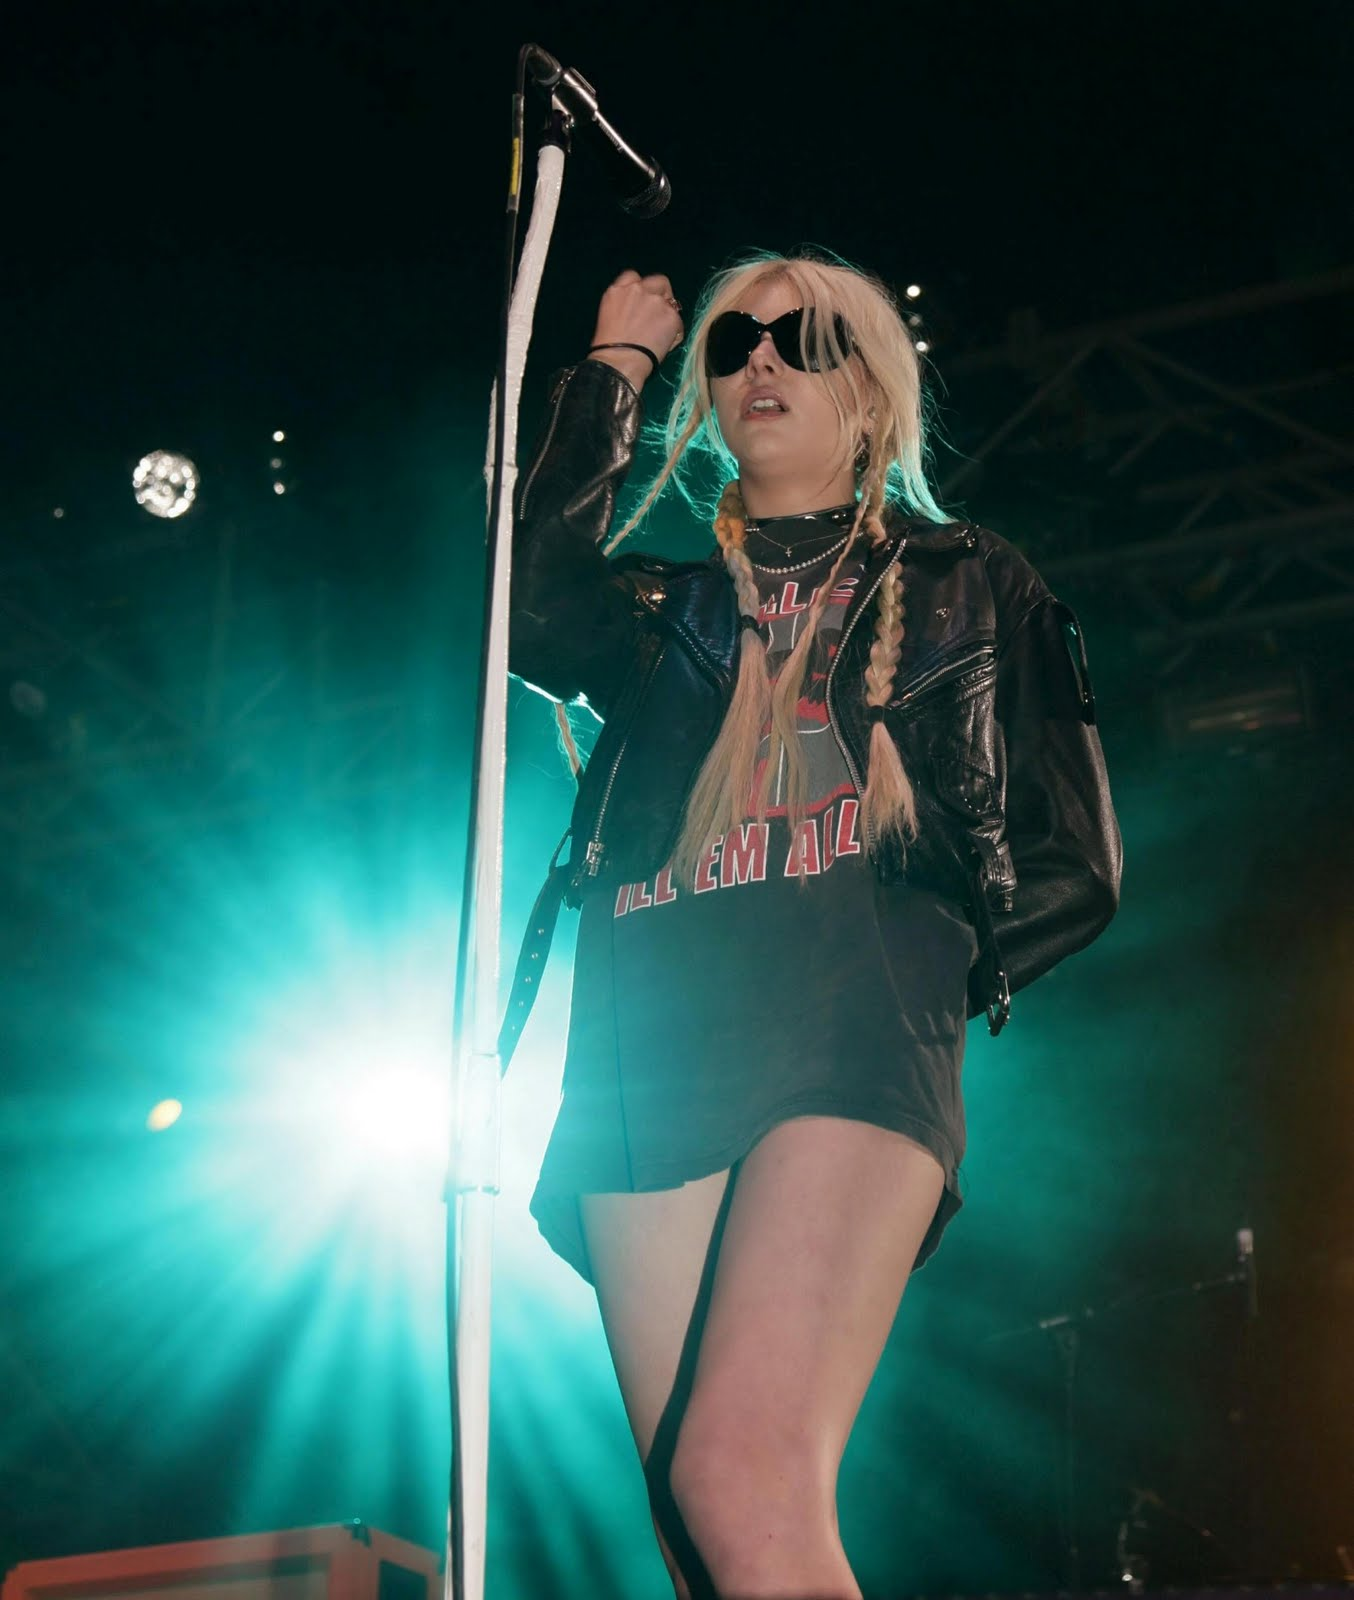 http://2.bp.blogspot.com/-uIUIZsmMNHA/ThM0ILLI4HI/AAAAAAAAIMc/iFdLxbN_Dq0/s1600/Taylor+Momsen+Flashes+Her+Panties+4.jpg